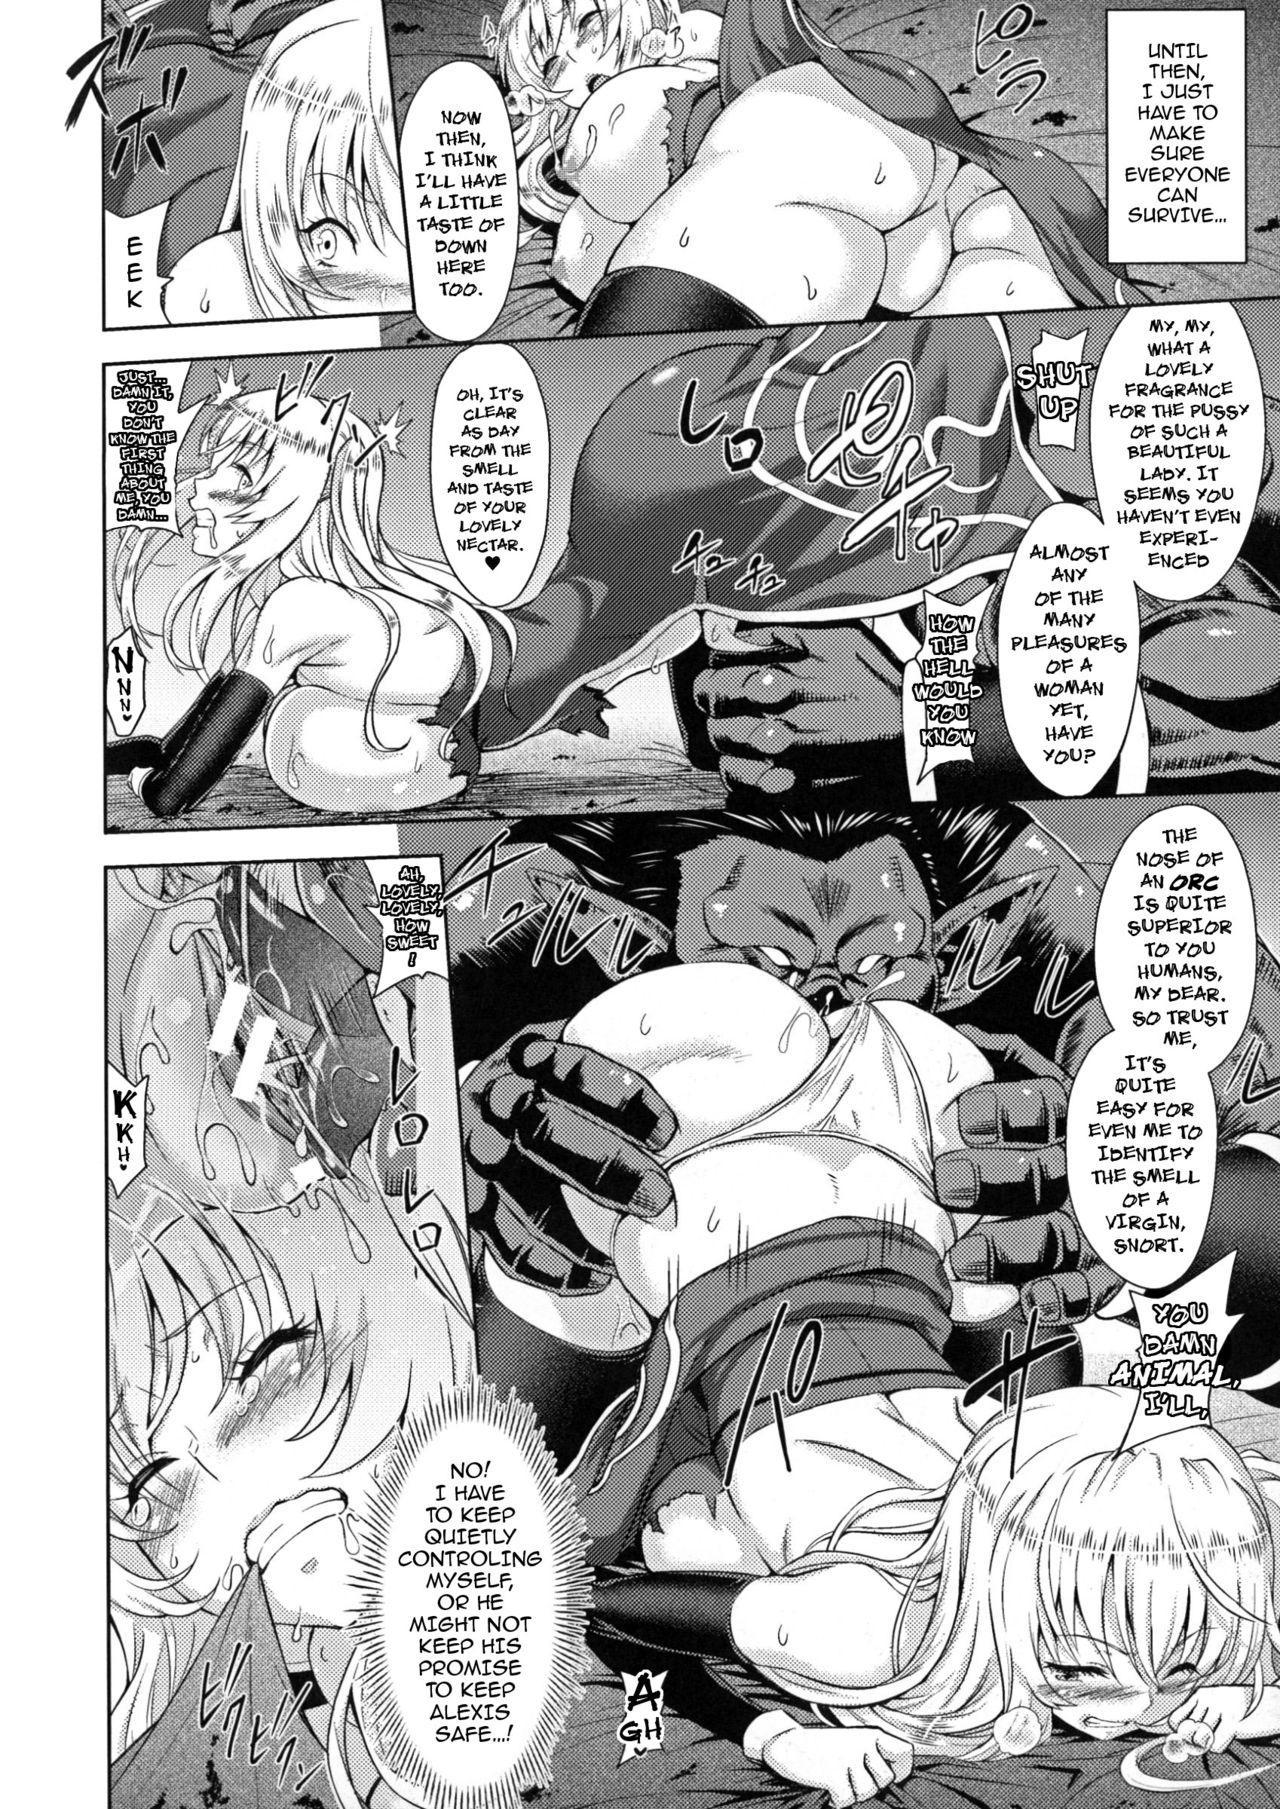 [Yamada Gogogo] Erona ~Orc no Inmon ni Okasareta Onna Kishi no Matsuro~ | Erona ~The Fall of a Beautiful Knight Cursed with the Lewd Mark of an Orc~ Ch. 1-3 [English] {darknight} 14